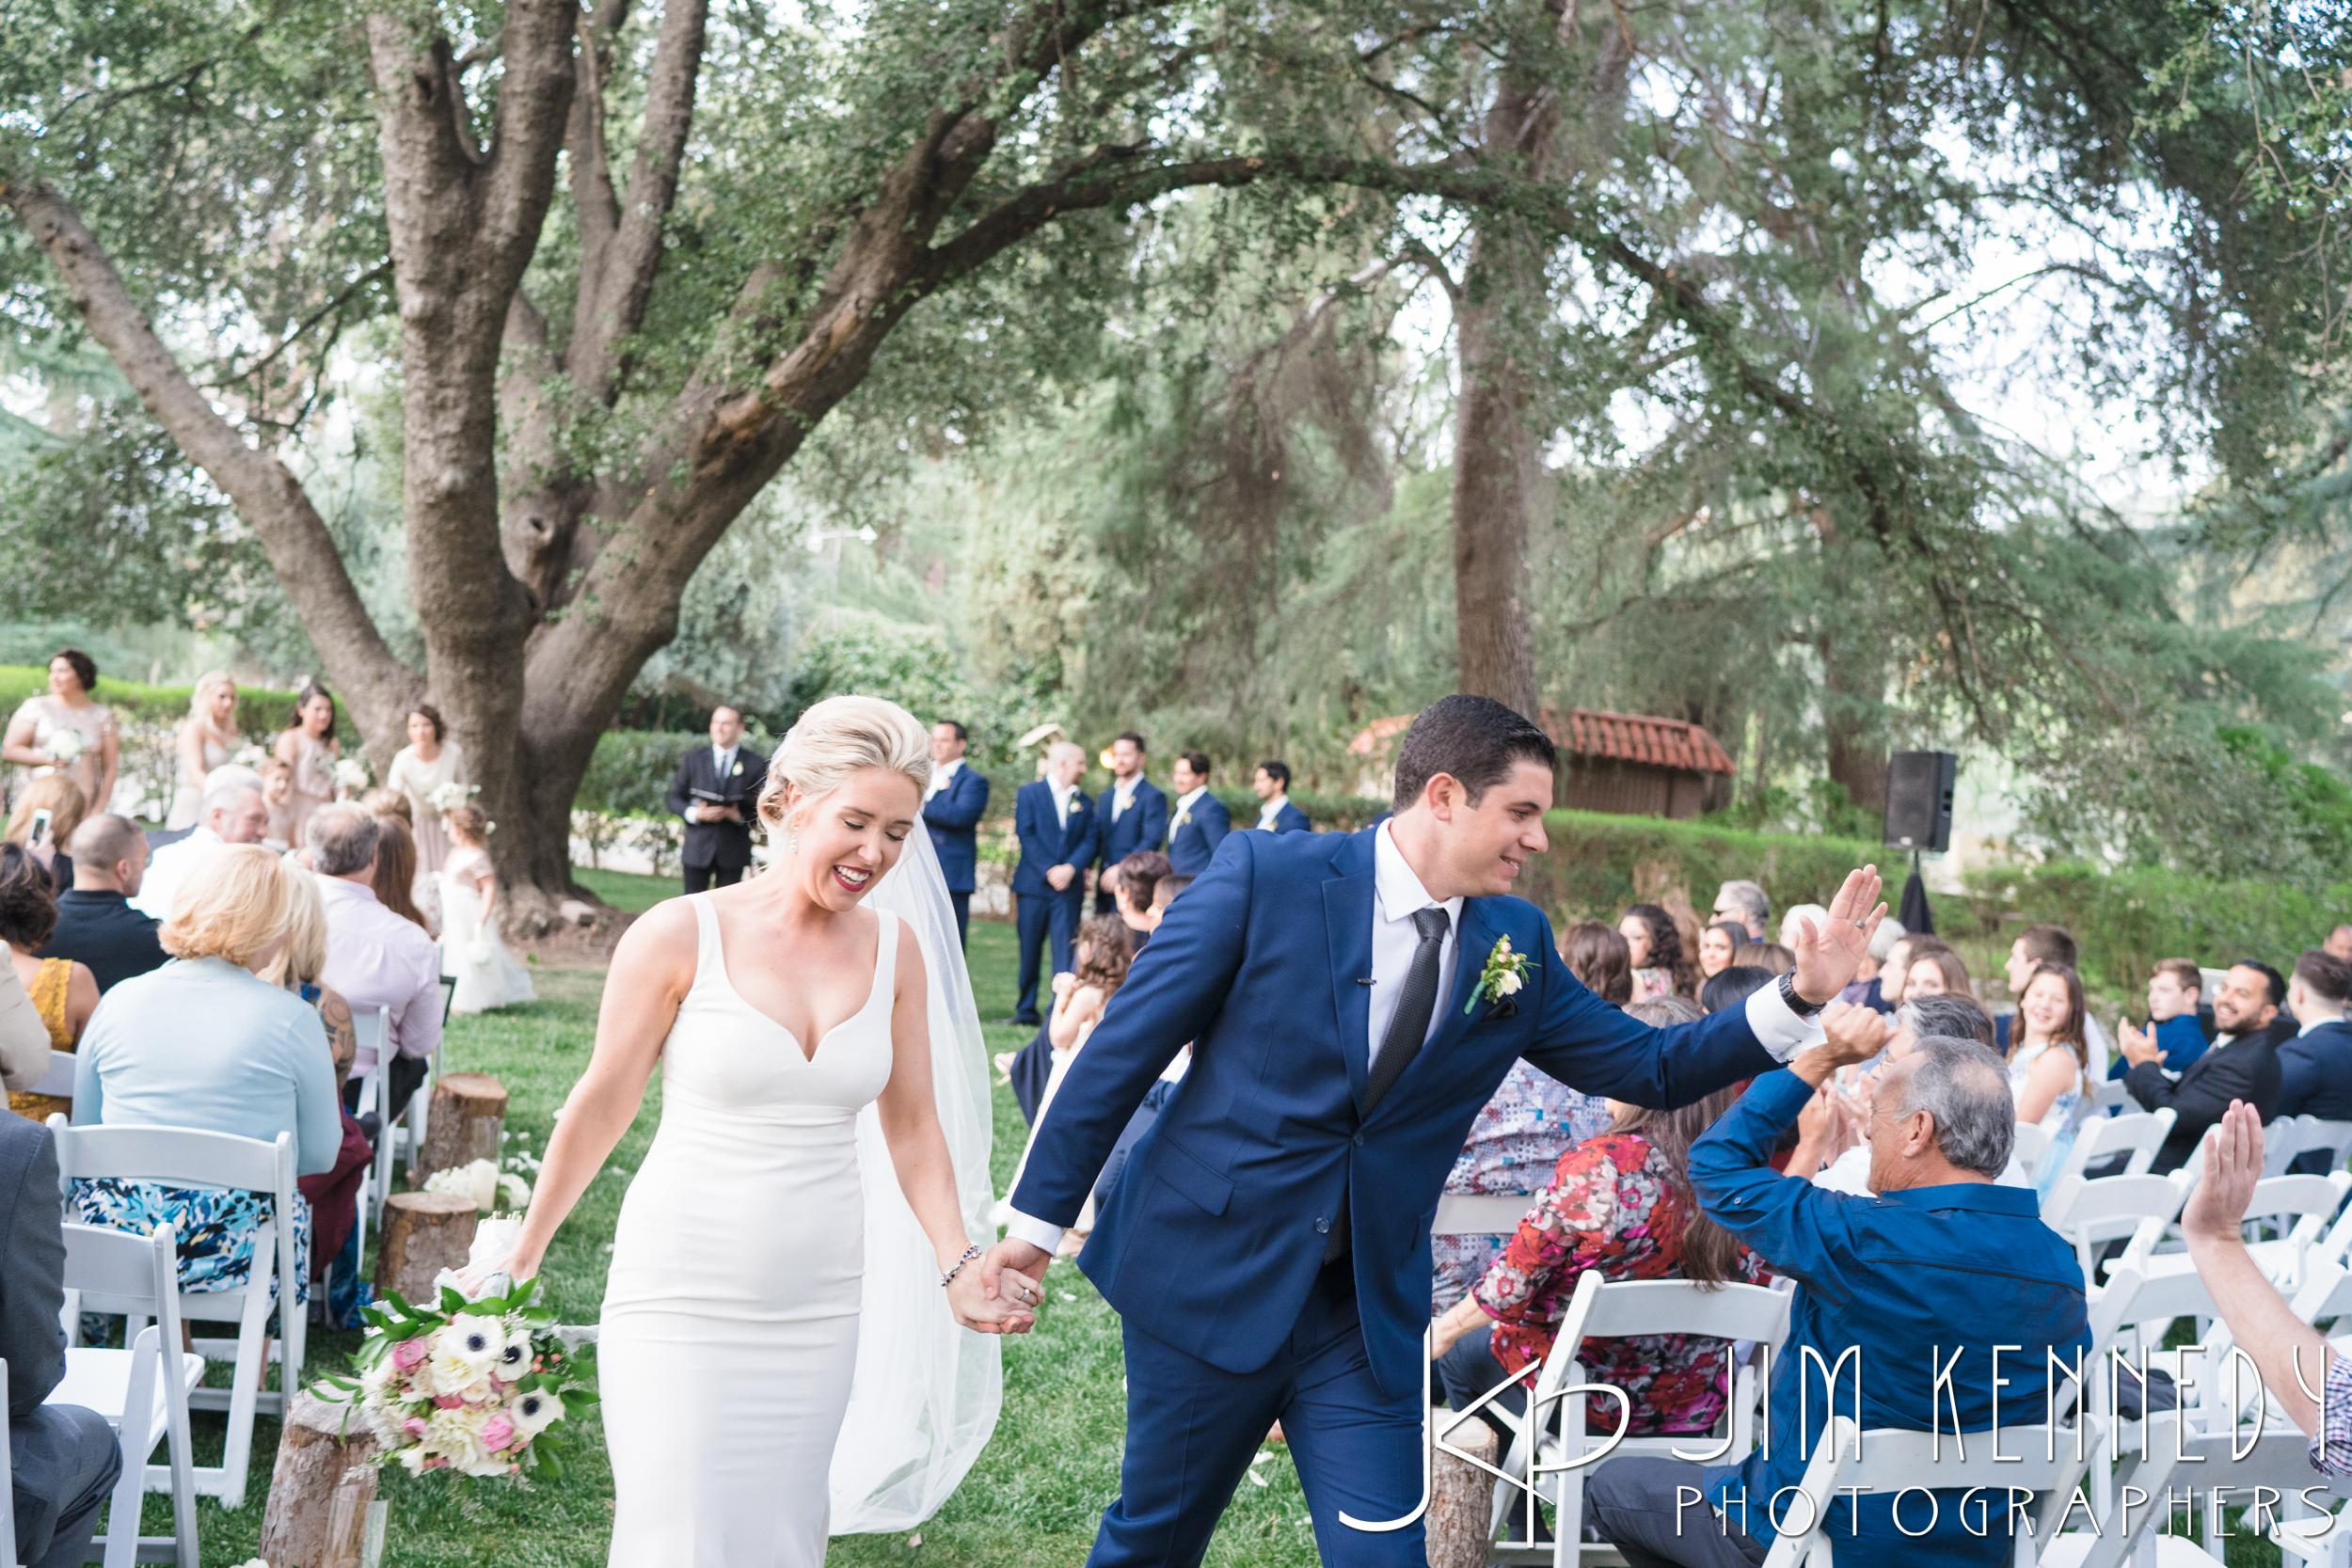 jim_kennedy_photographers_highland_springs_wedding_caitlyn_0126.jpg